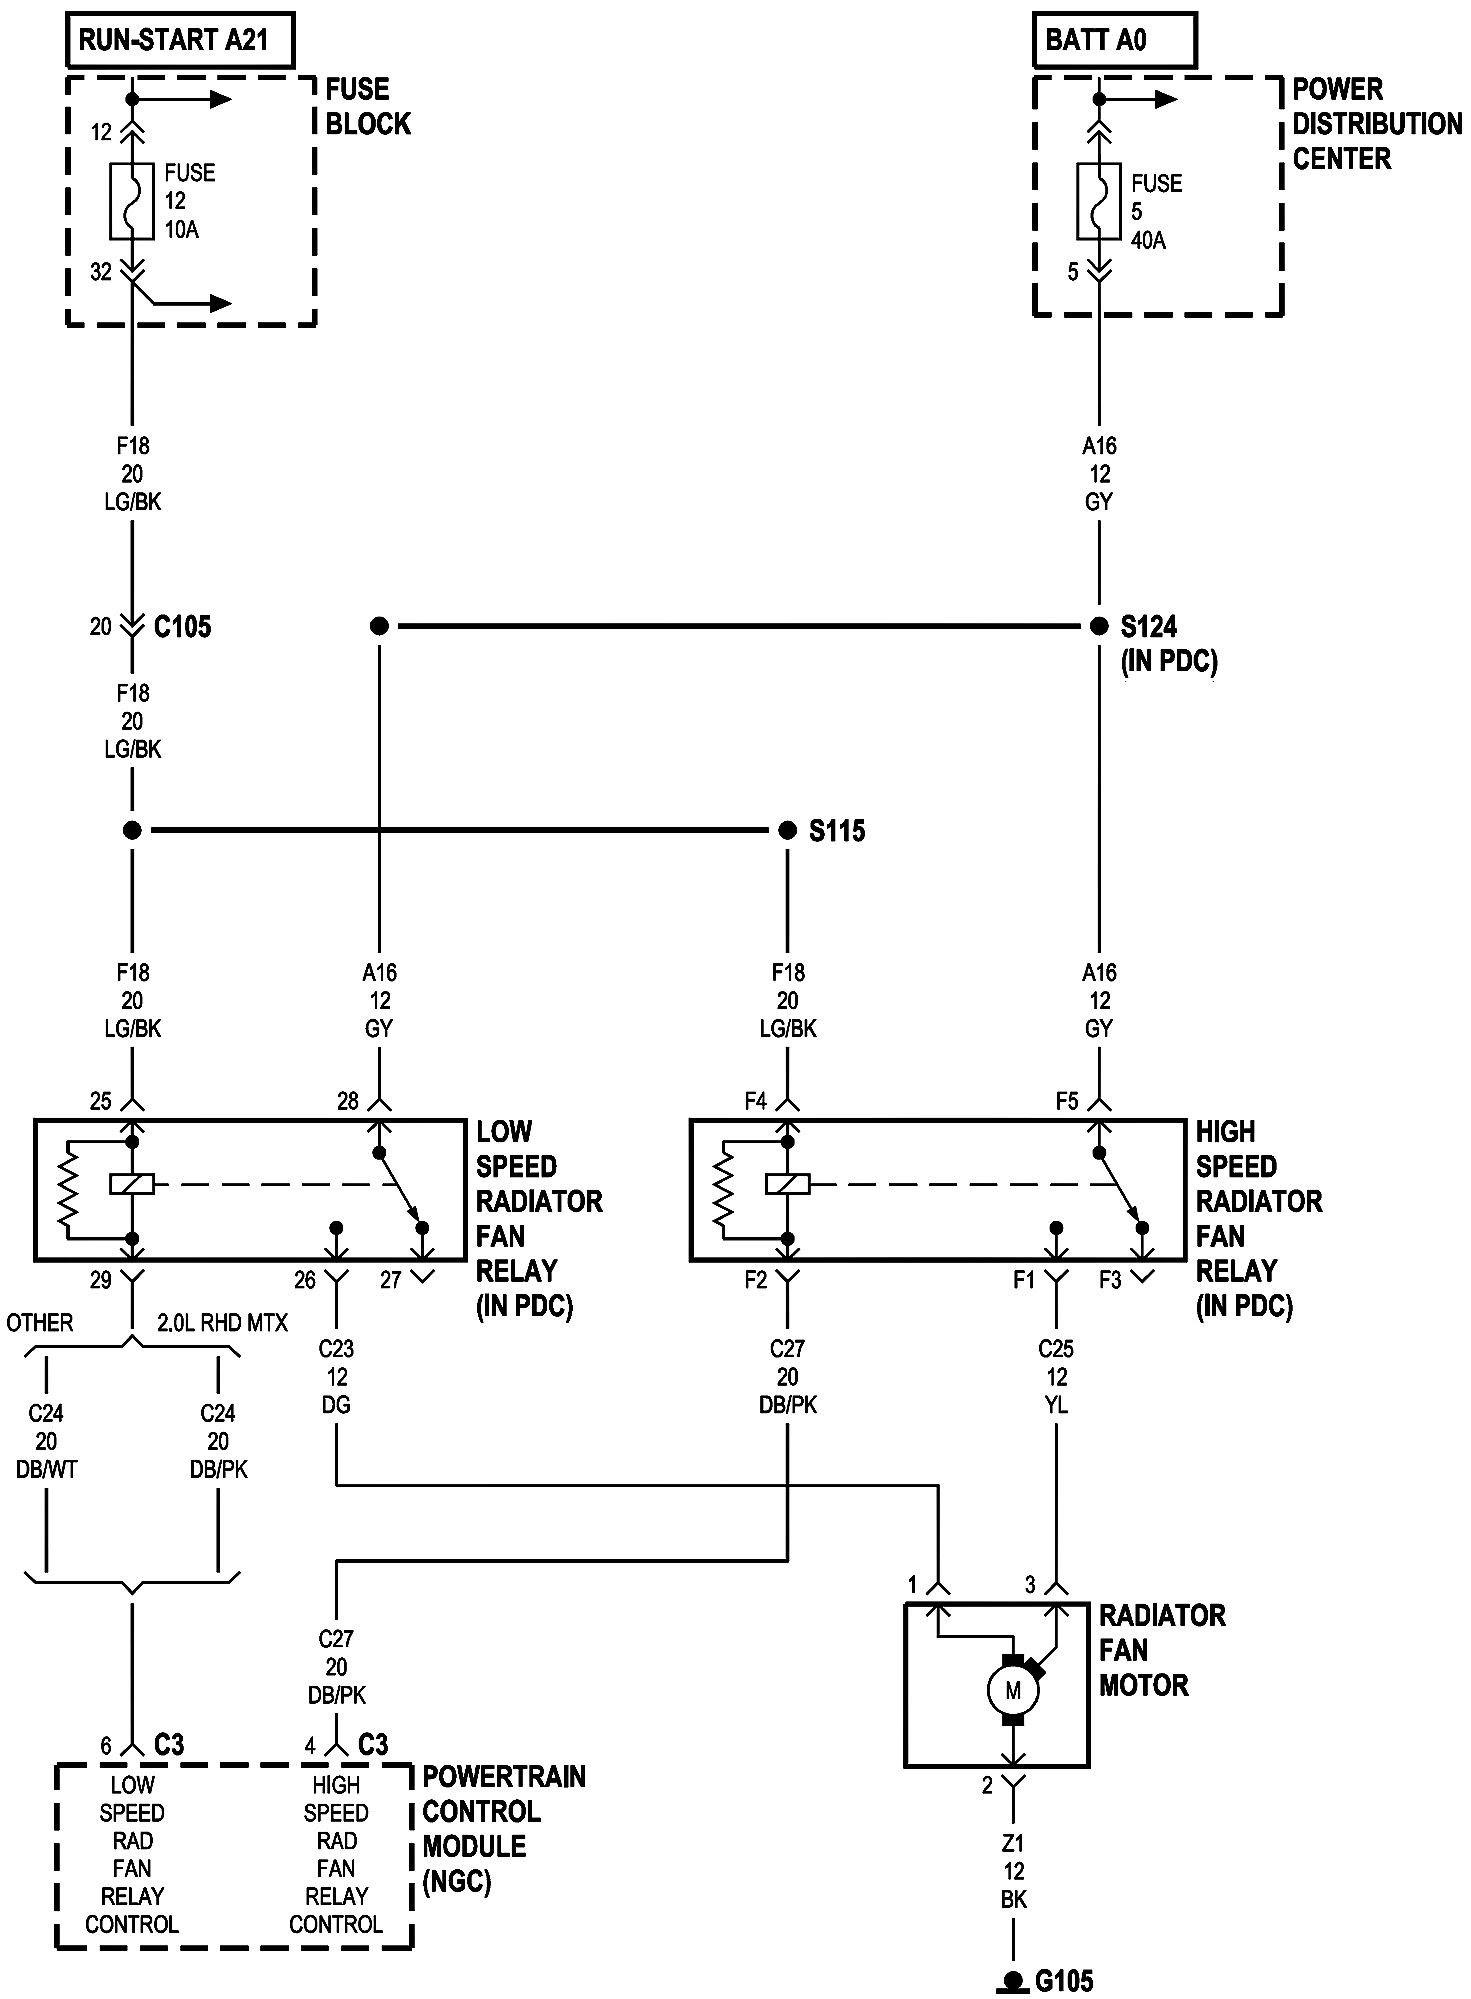 2007 Chrysler Pt Cruiser Wiring Diagrams Wiring Diagram Bike Variable A Bike Variable A Gobep It